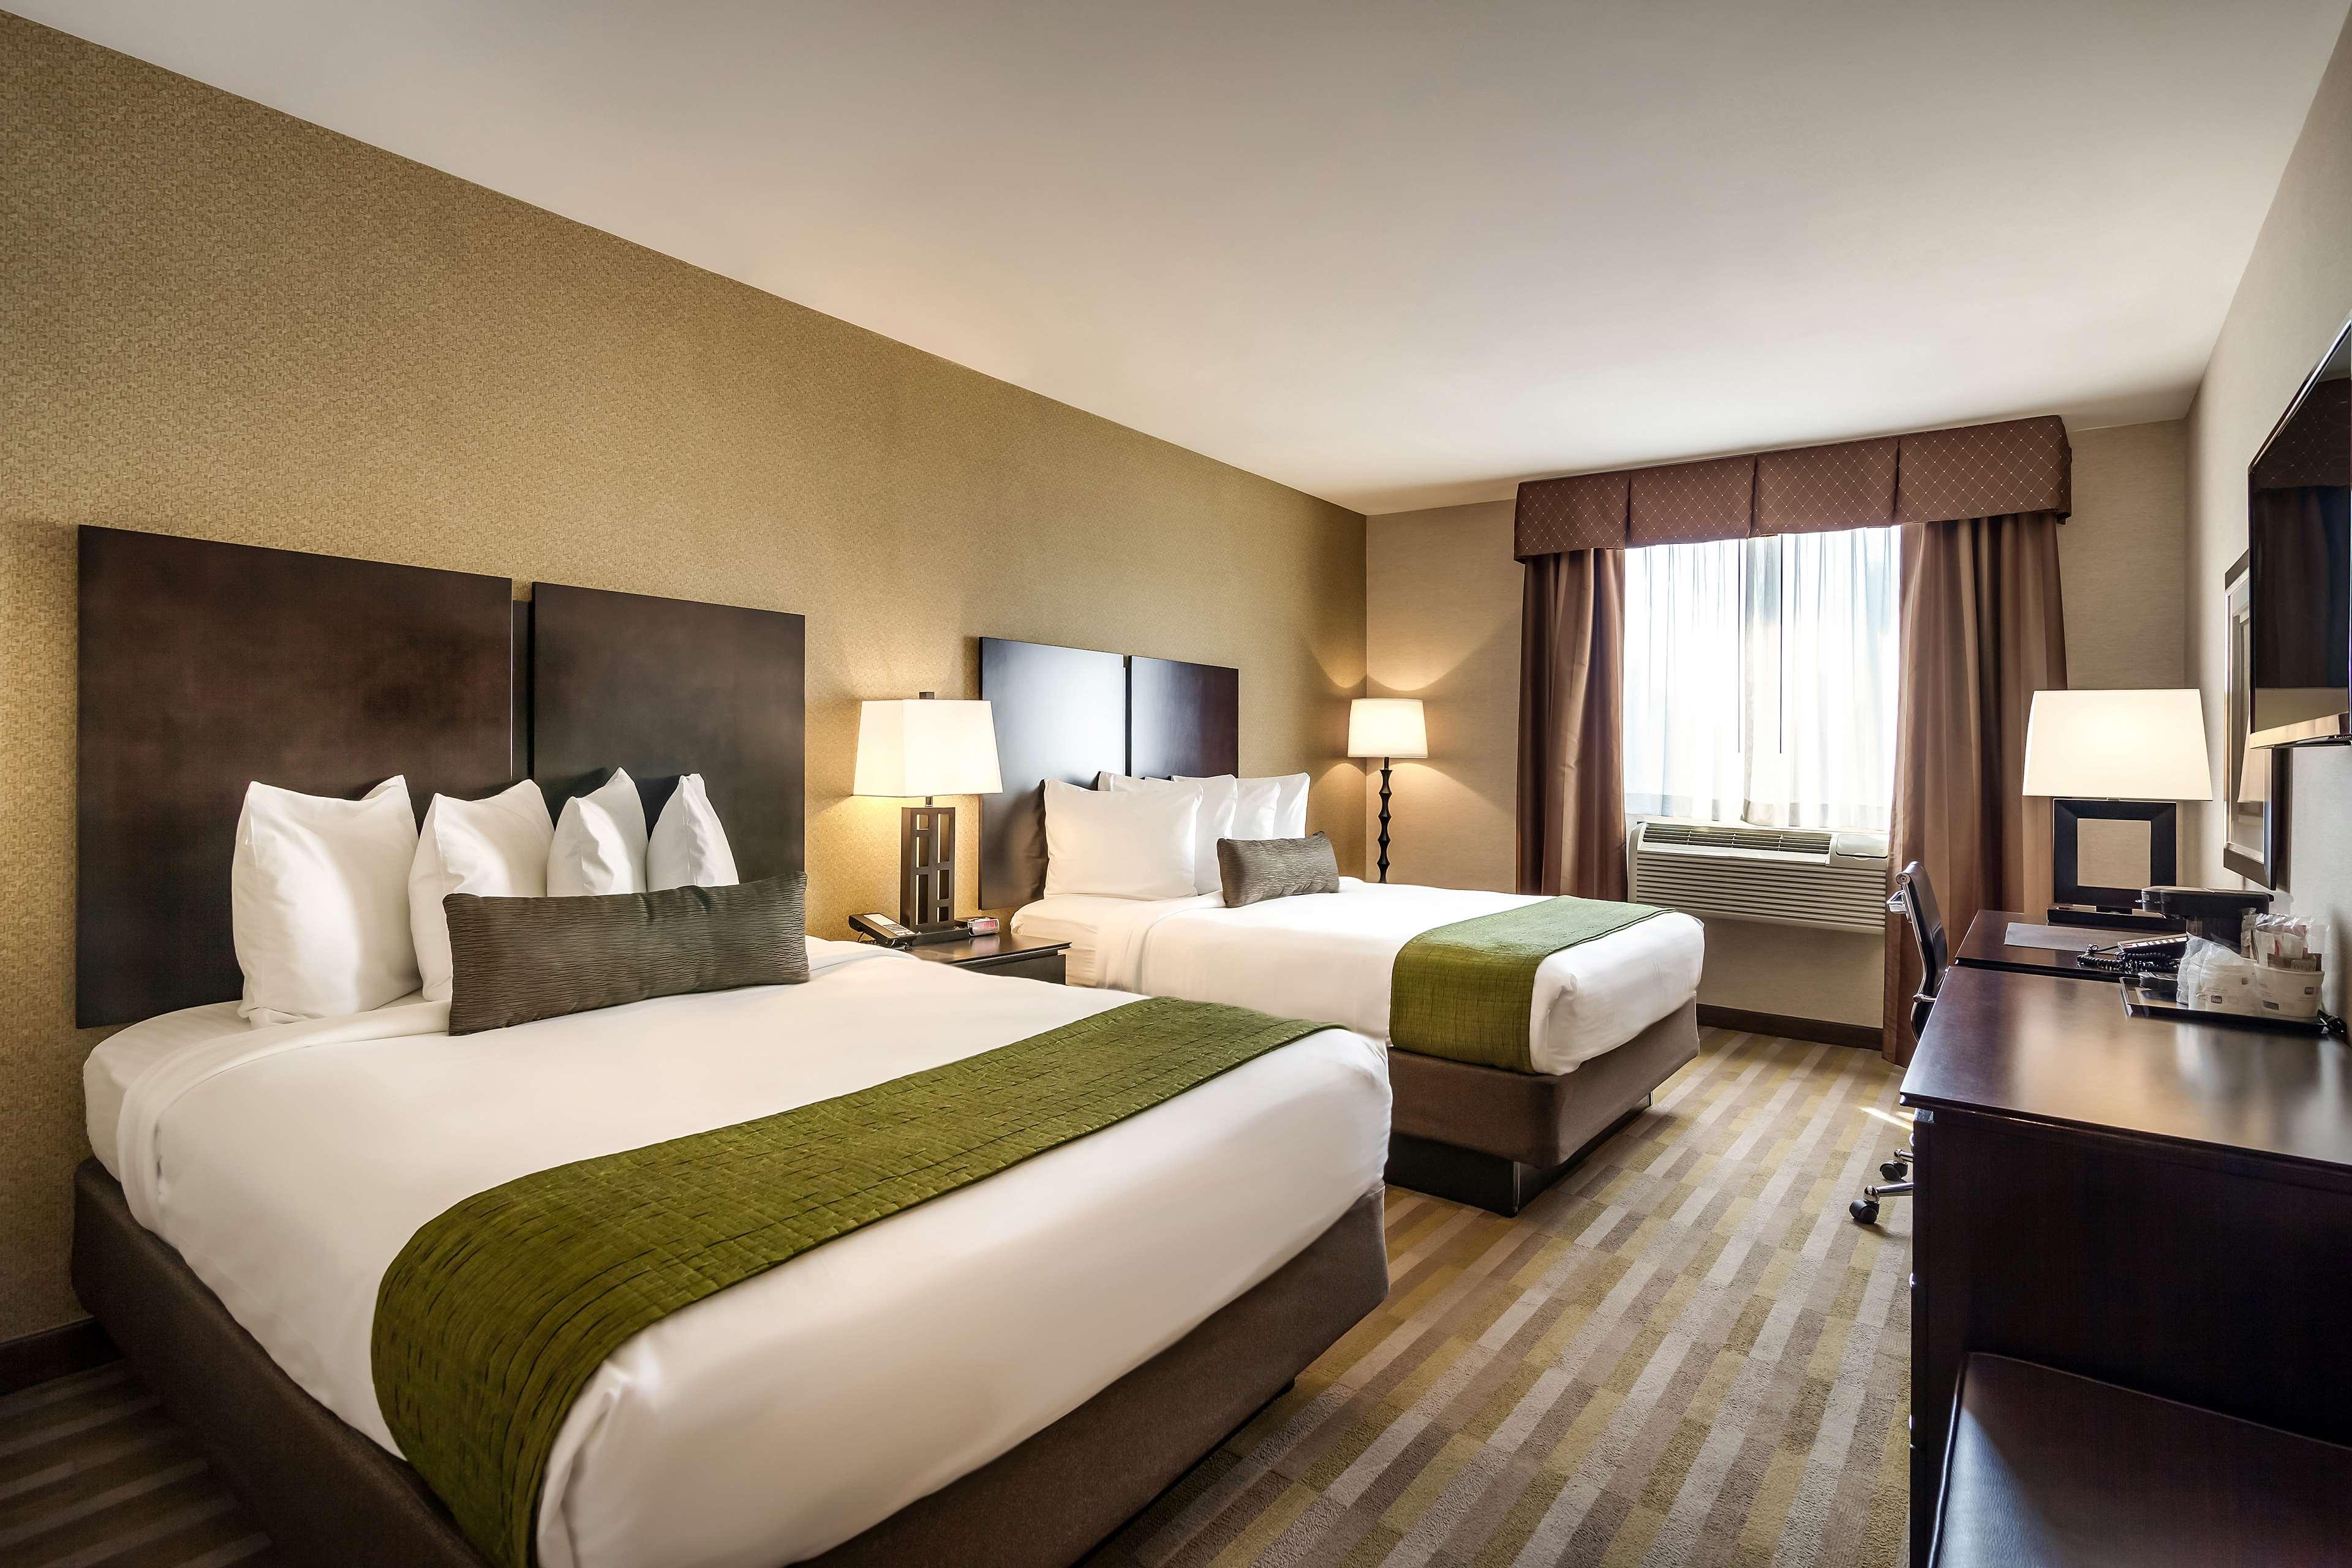 Best Western Plus Plaza Hotel image 27